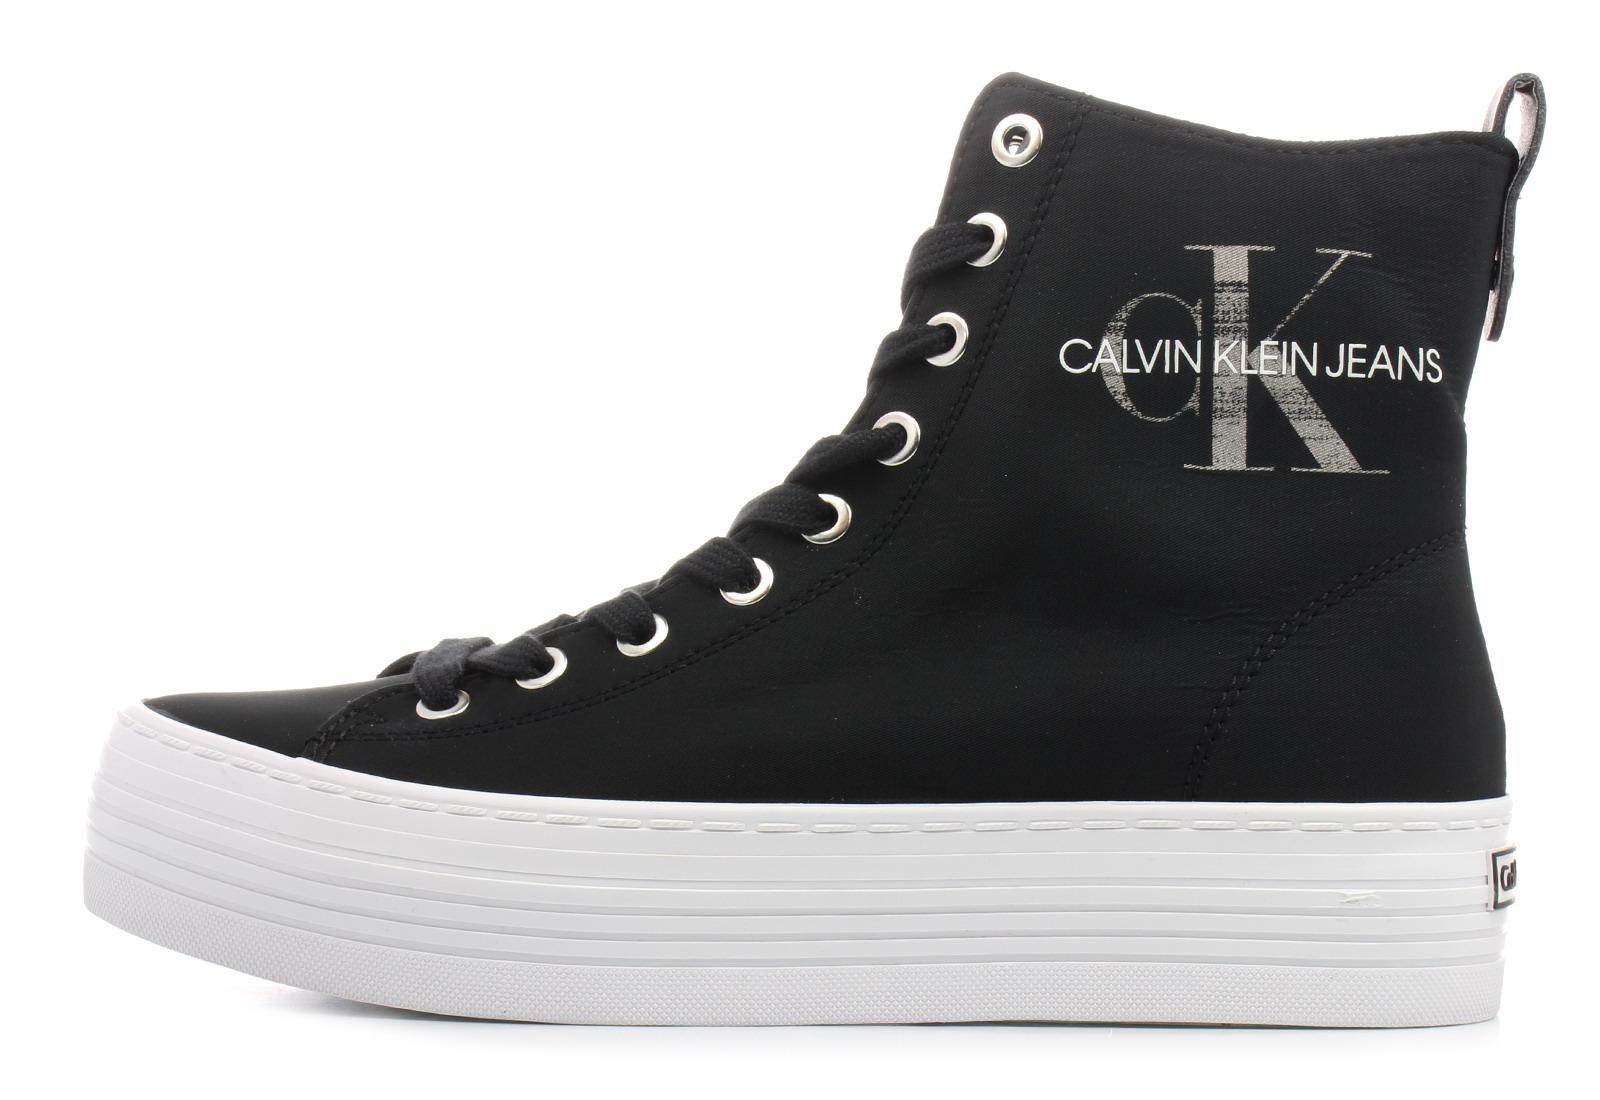 35c1355a25 Calvin Klein Jeans Topánky - Zazah - RE9794-BLK - Tenisky